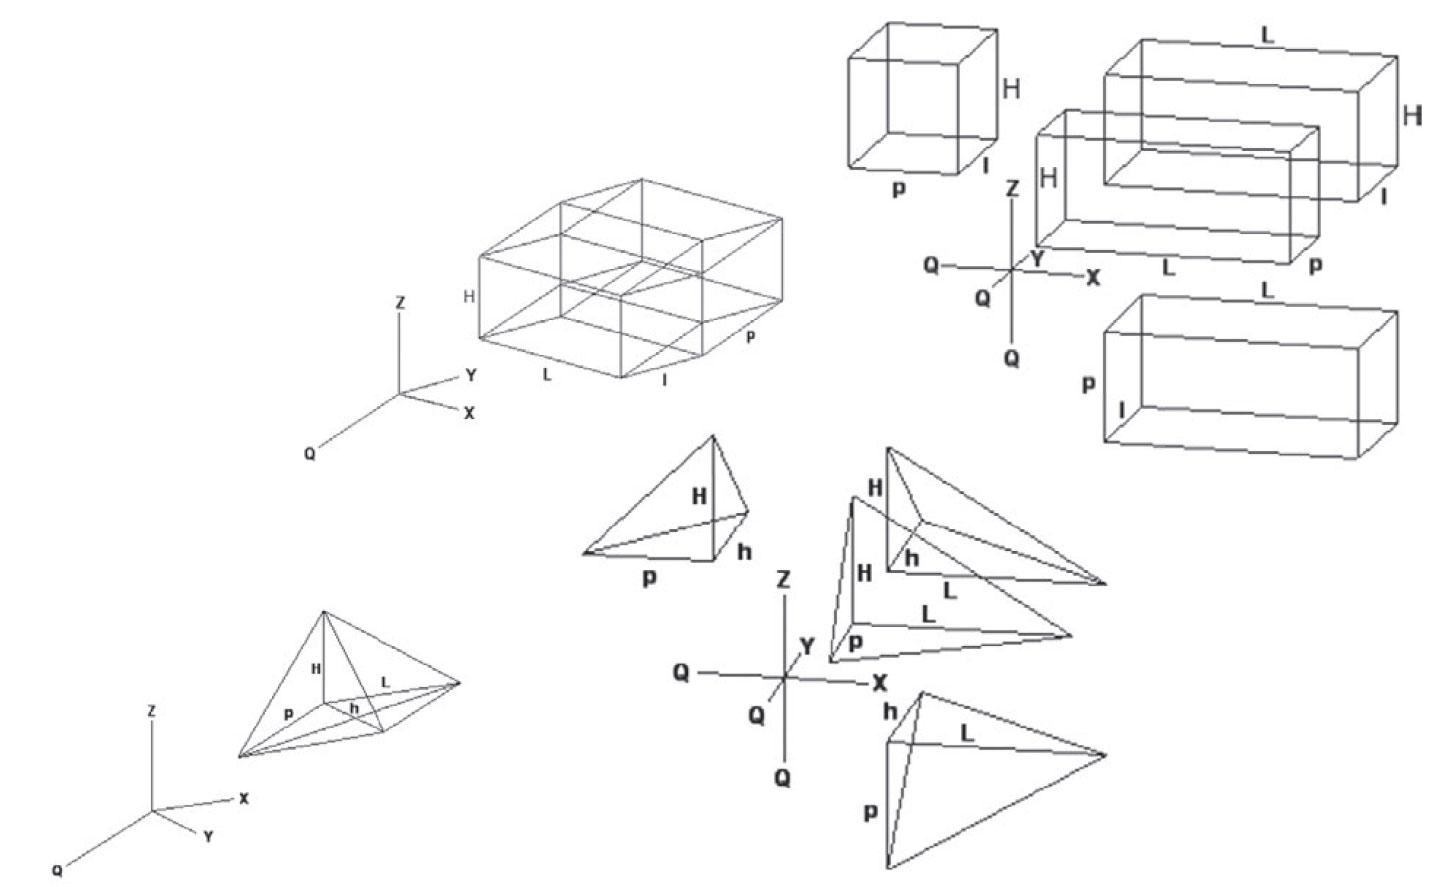 matematica-4-dimensiuni-stiinta-tehnica-14